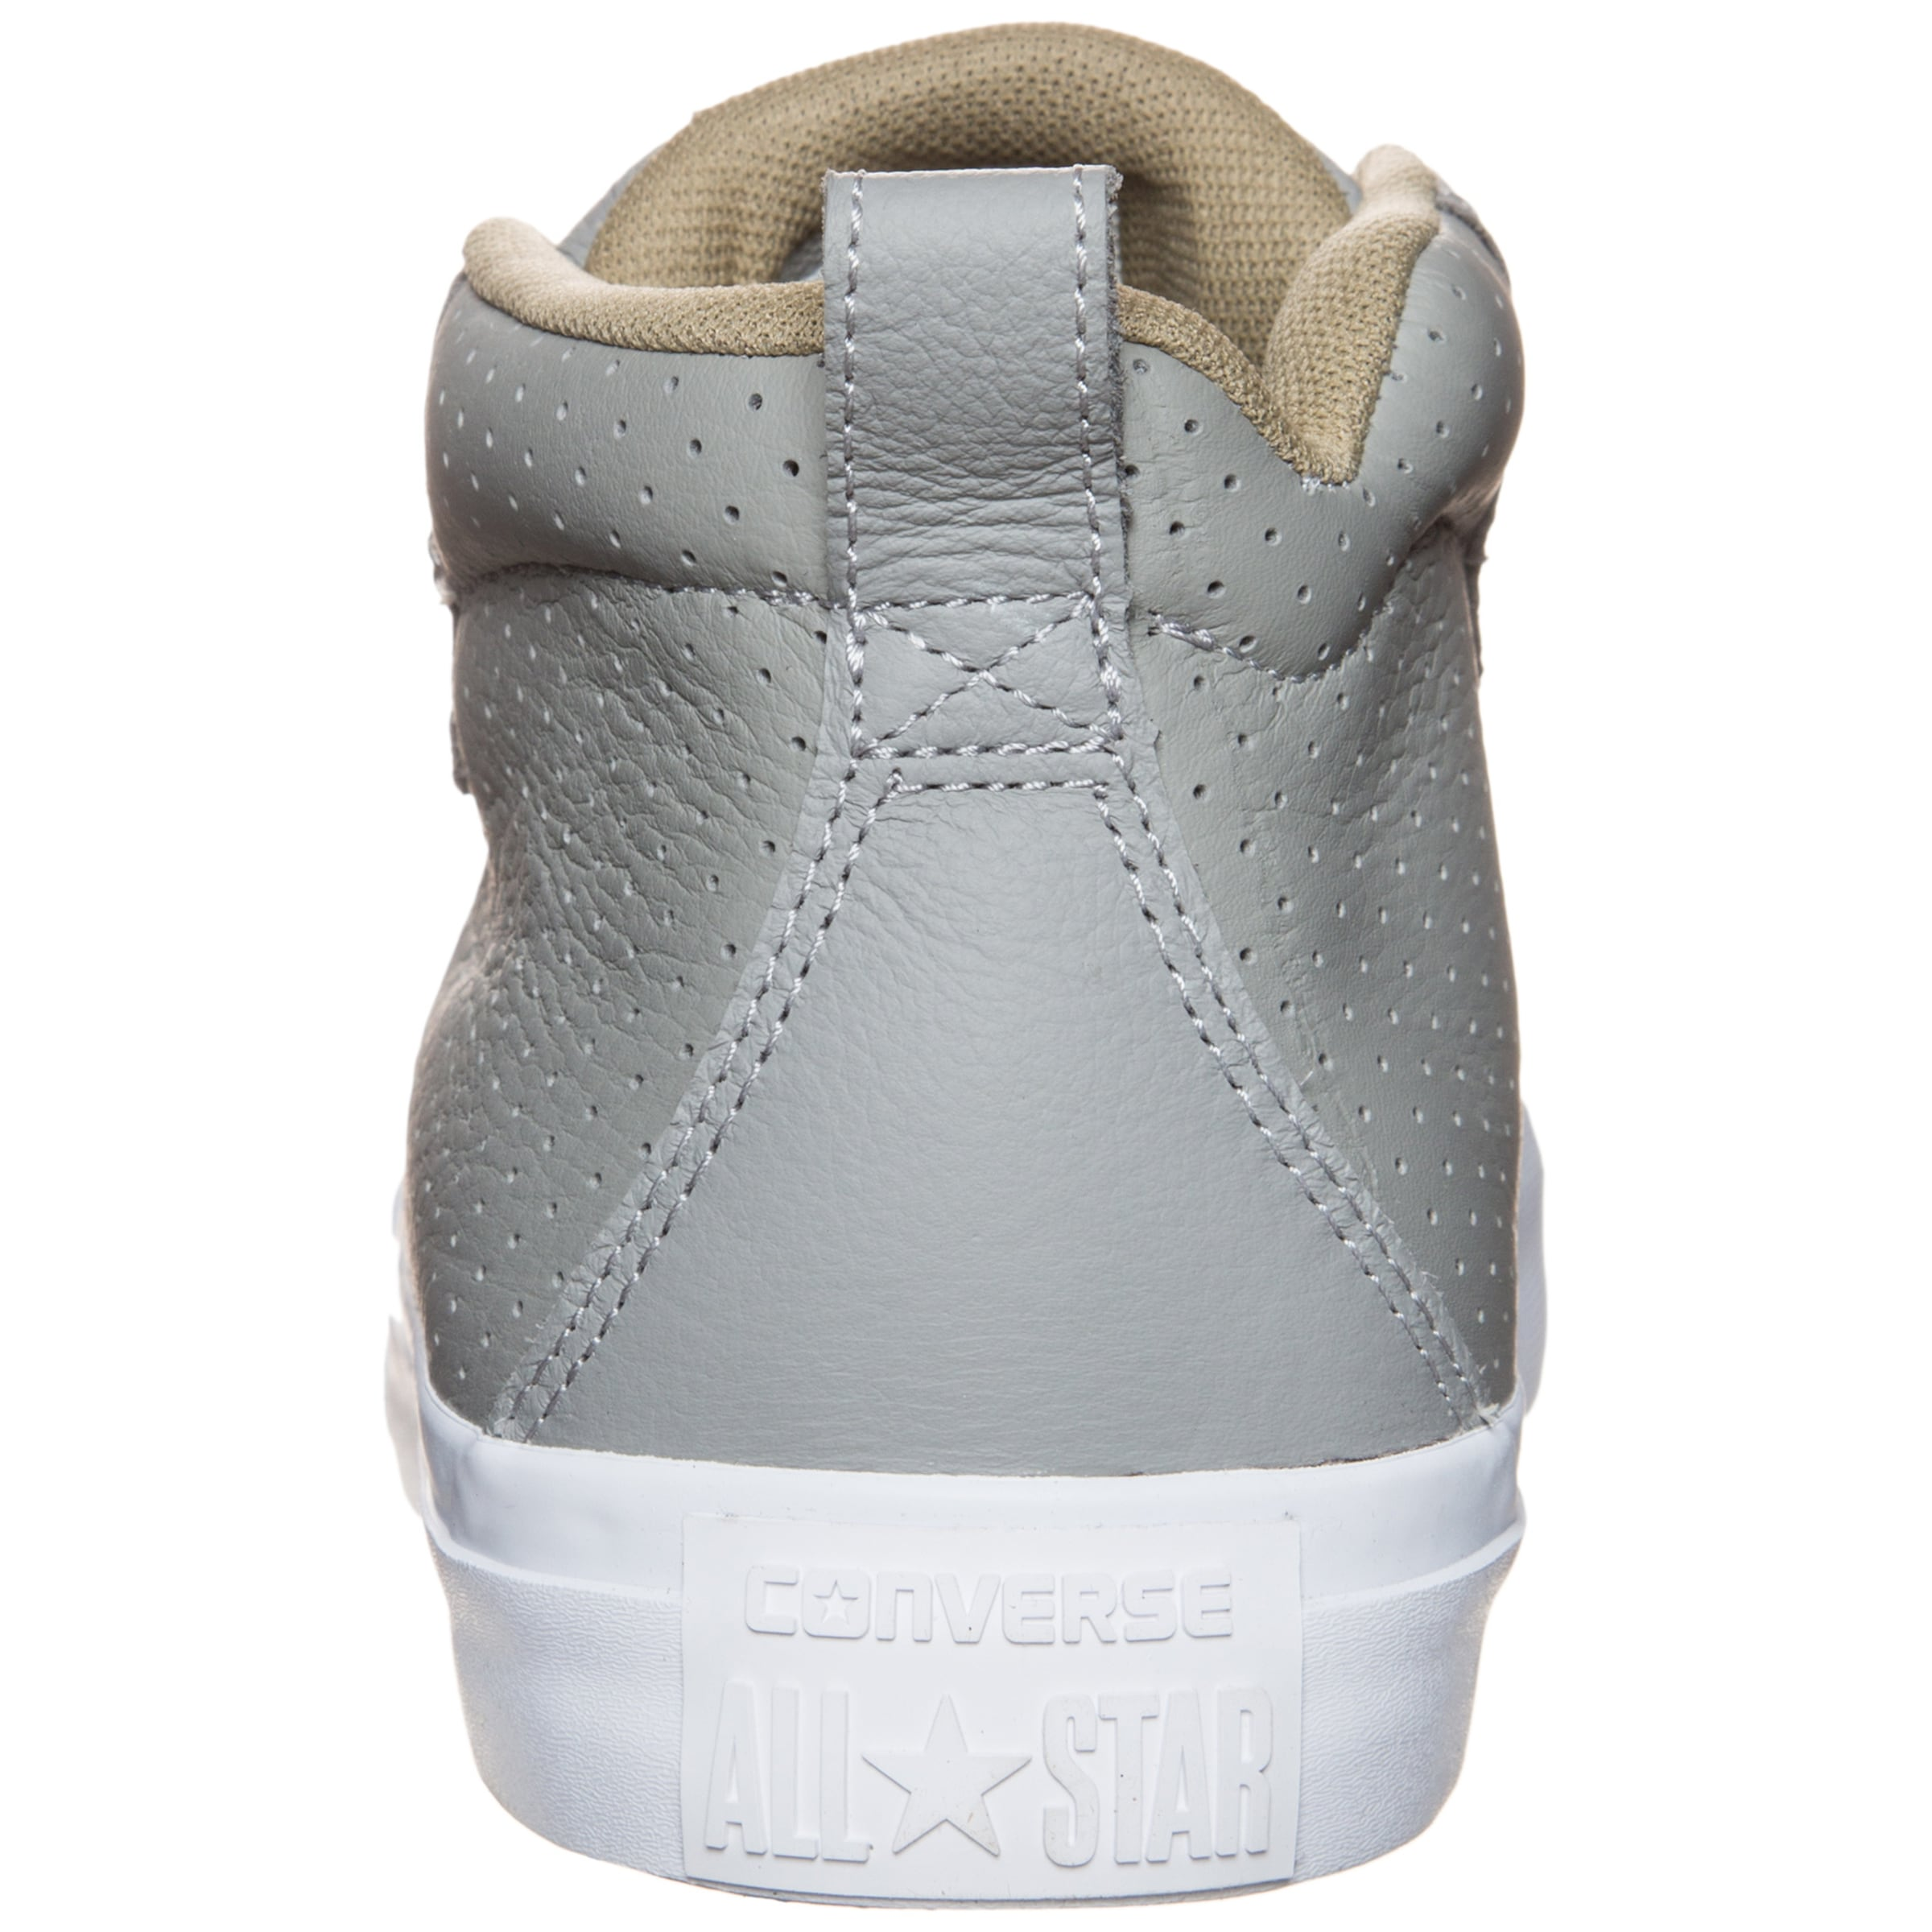 In All Star Sneaker Fulton Converse Grau Mid LVGzpjMqSU